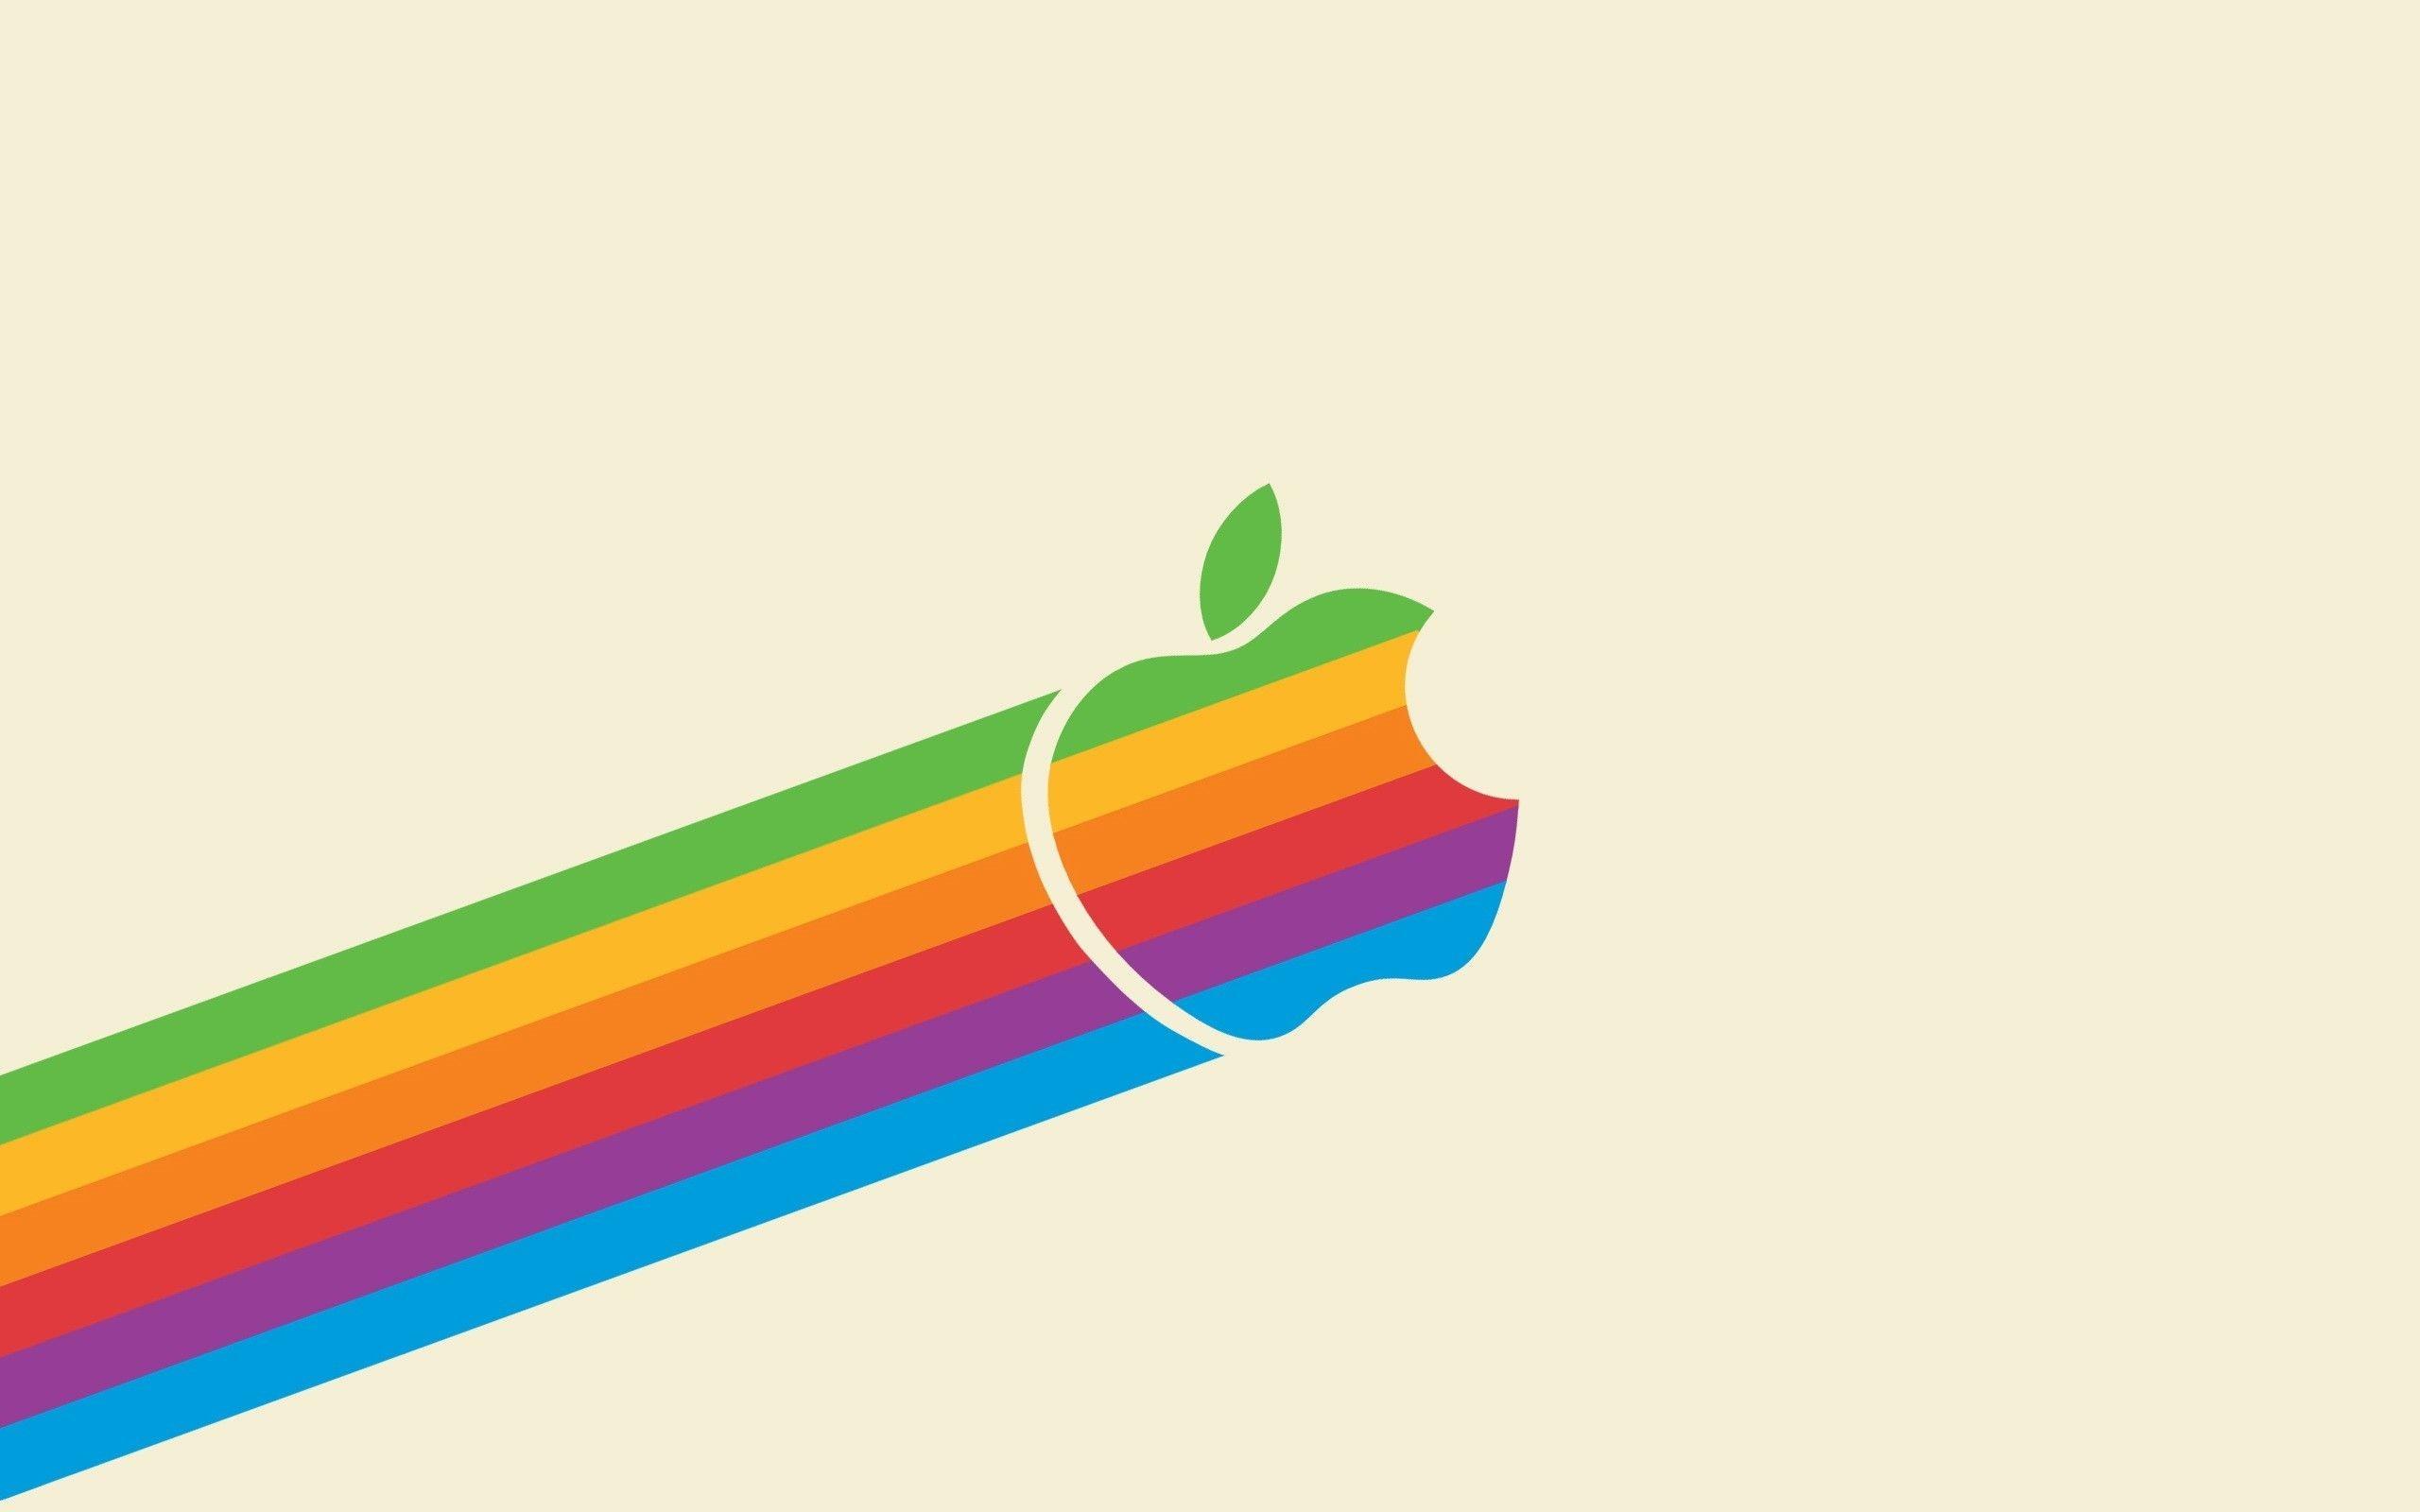 Res: 2560x1600, Free logo Mac Wallpapers, iMac Wallpapers, Retina MacBook Pro